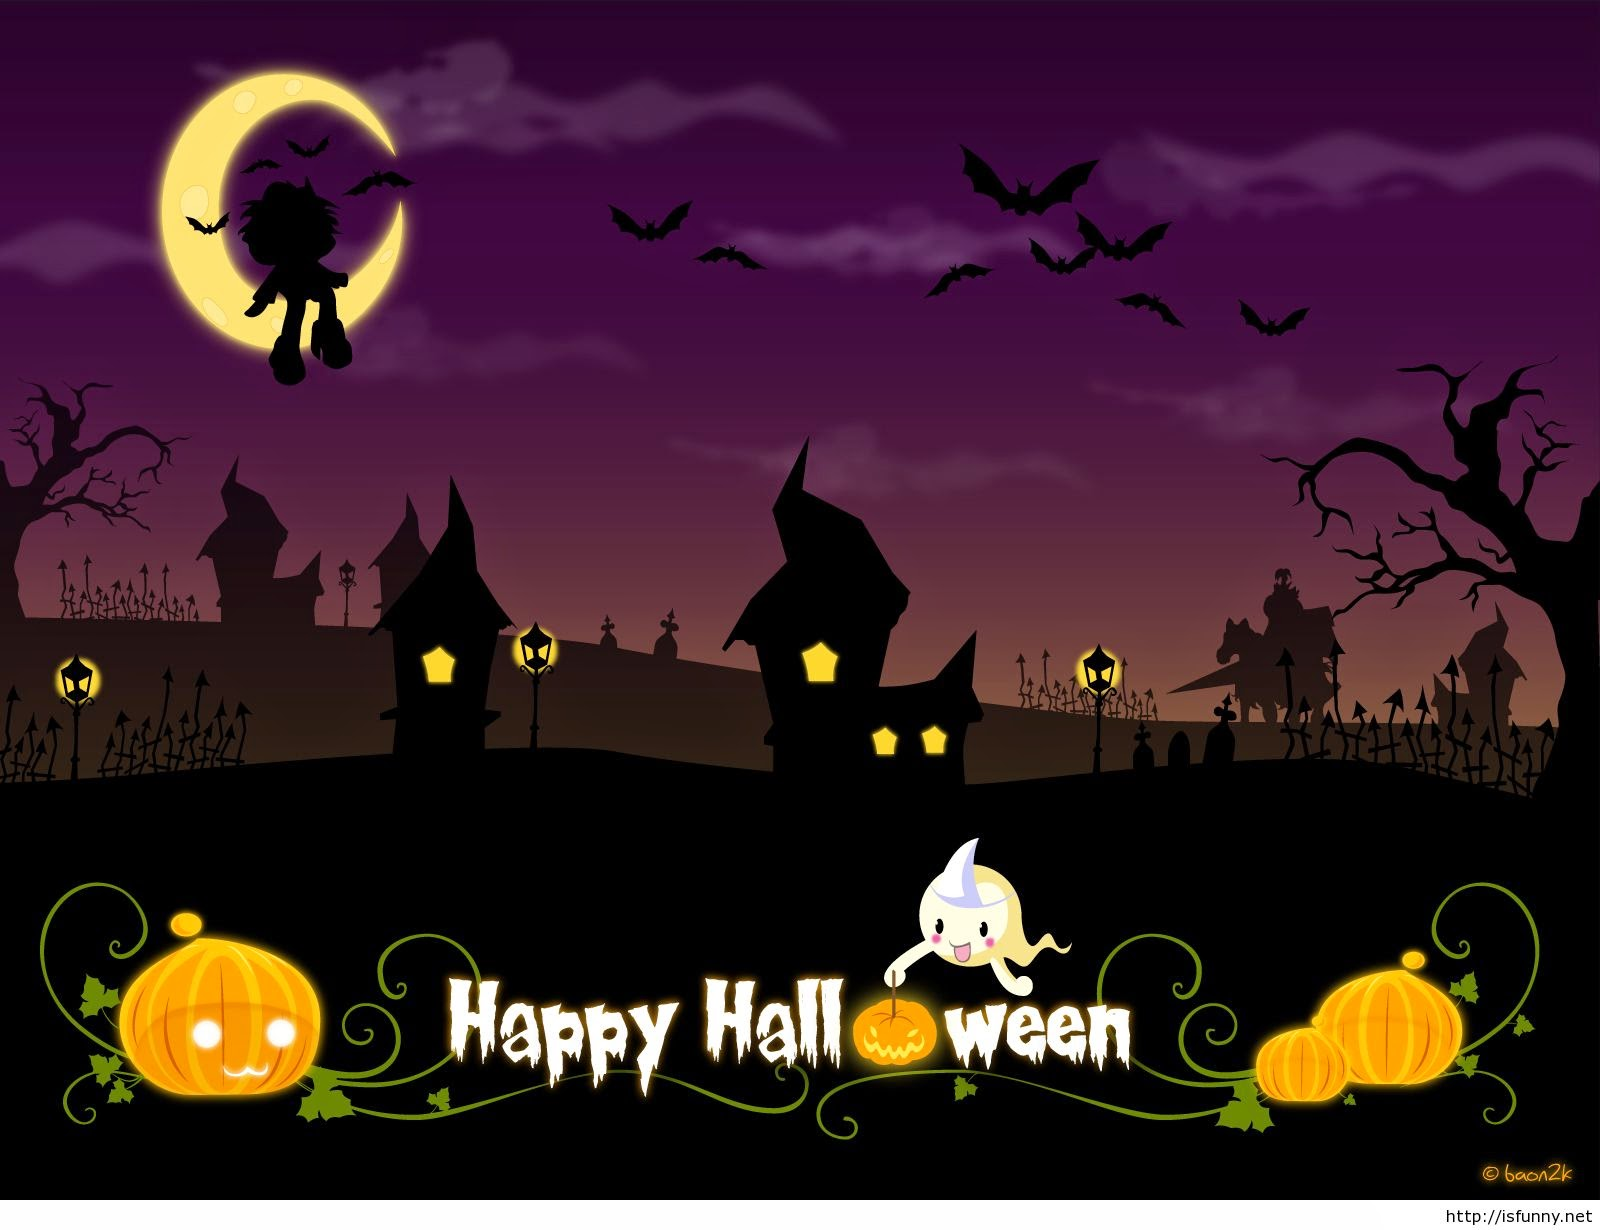 HAPPY HALLOWEEN MEME | Halloween Day